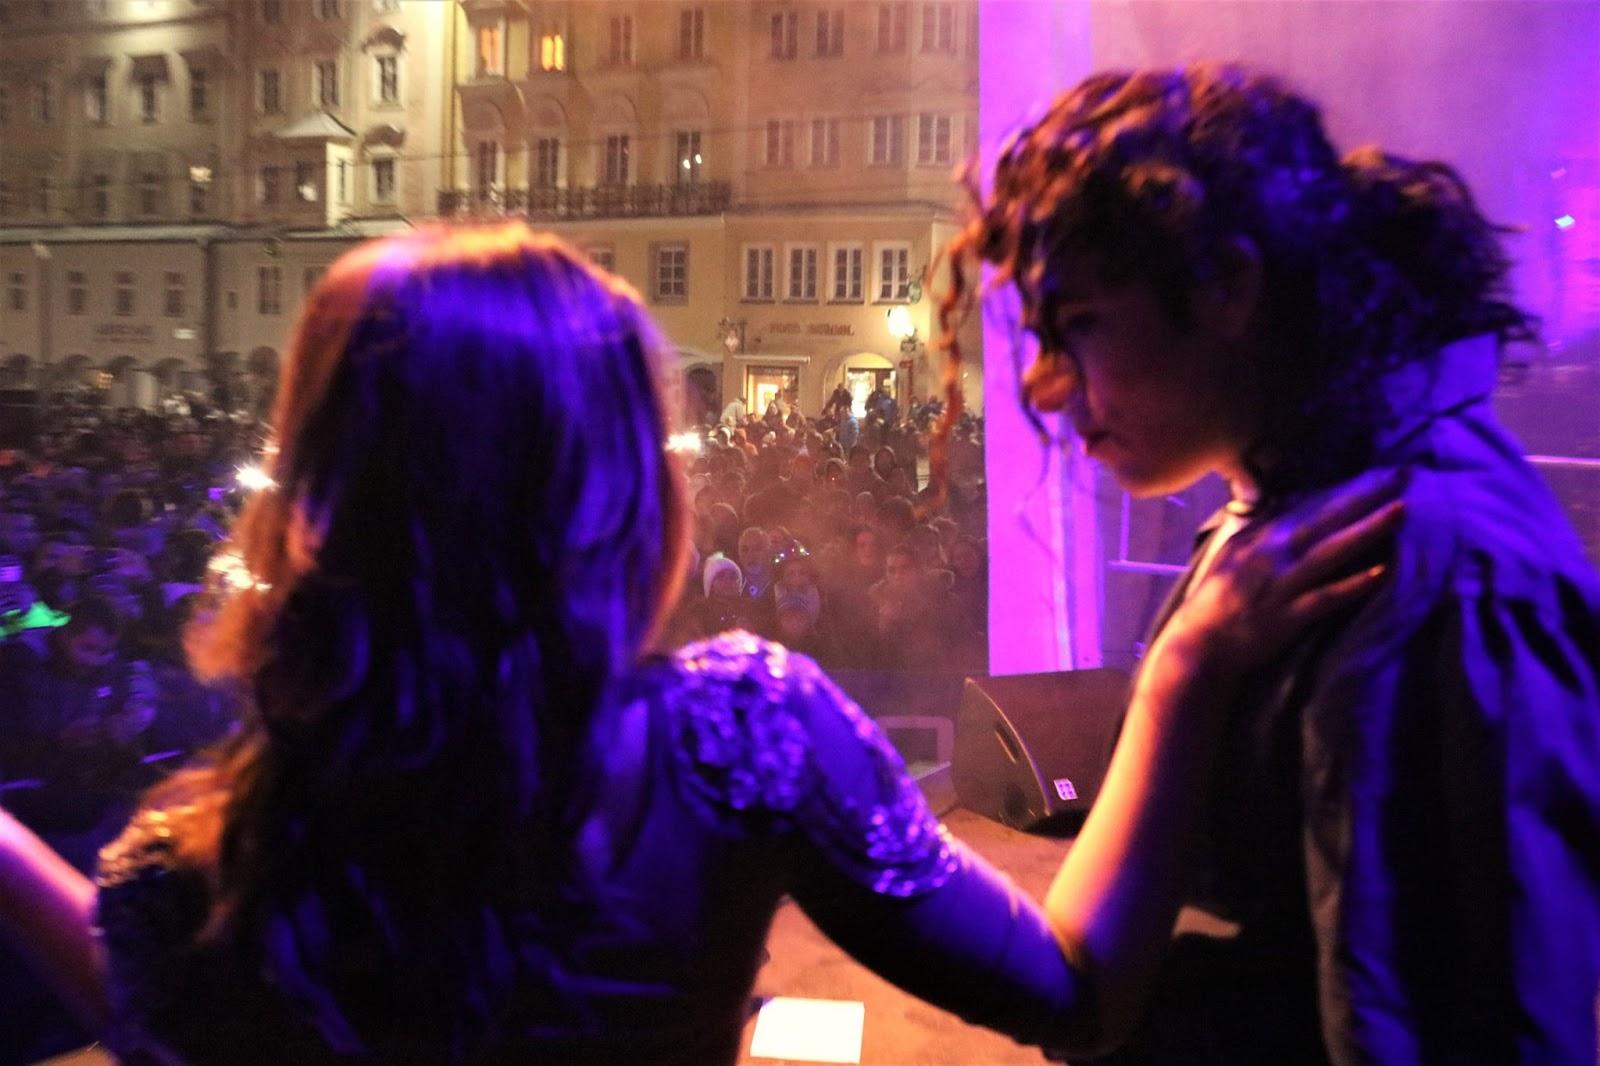 Delfim Miranda - Michael Jackson Tribute - The Way You Make Me Feel - Live in Linz - Austria